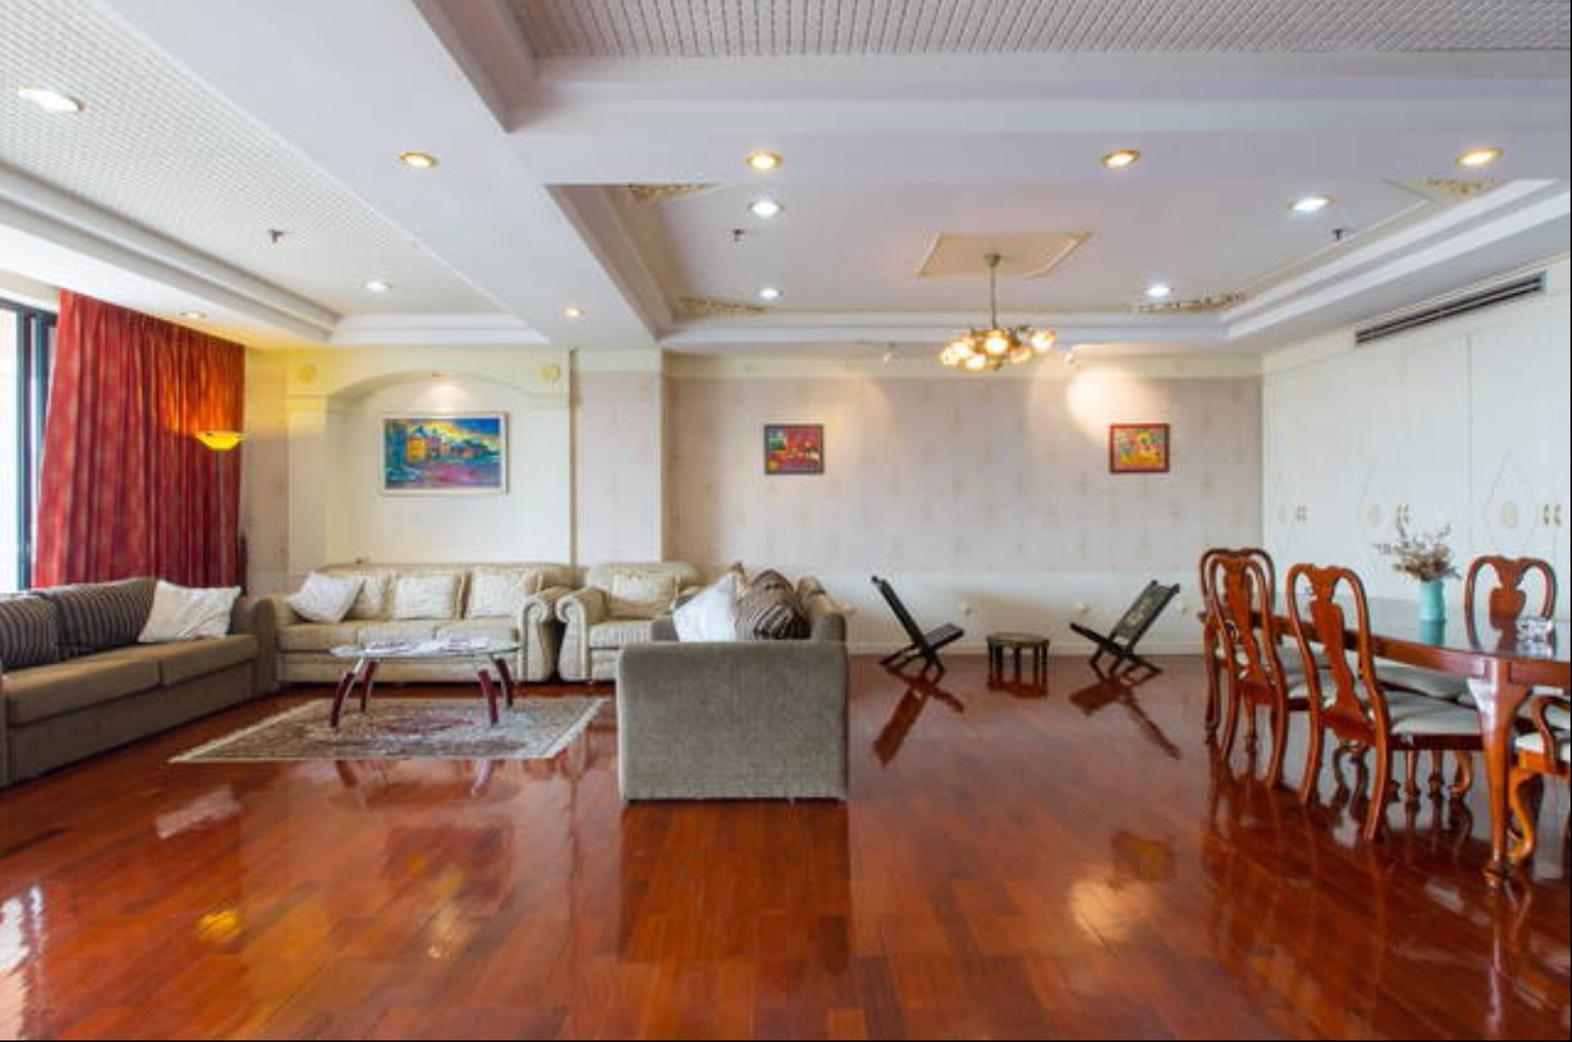 Spacious Apartment near Lumpini Park Spacious Apartment near Lumpini Park